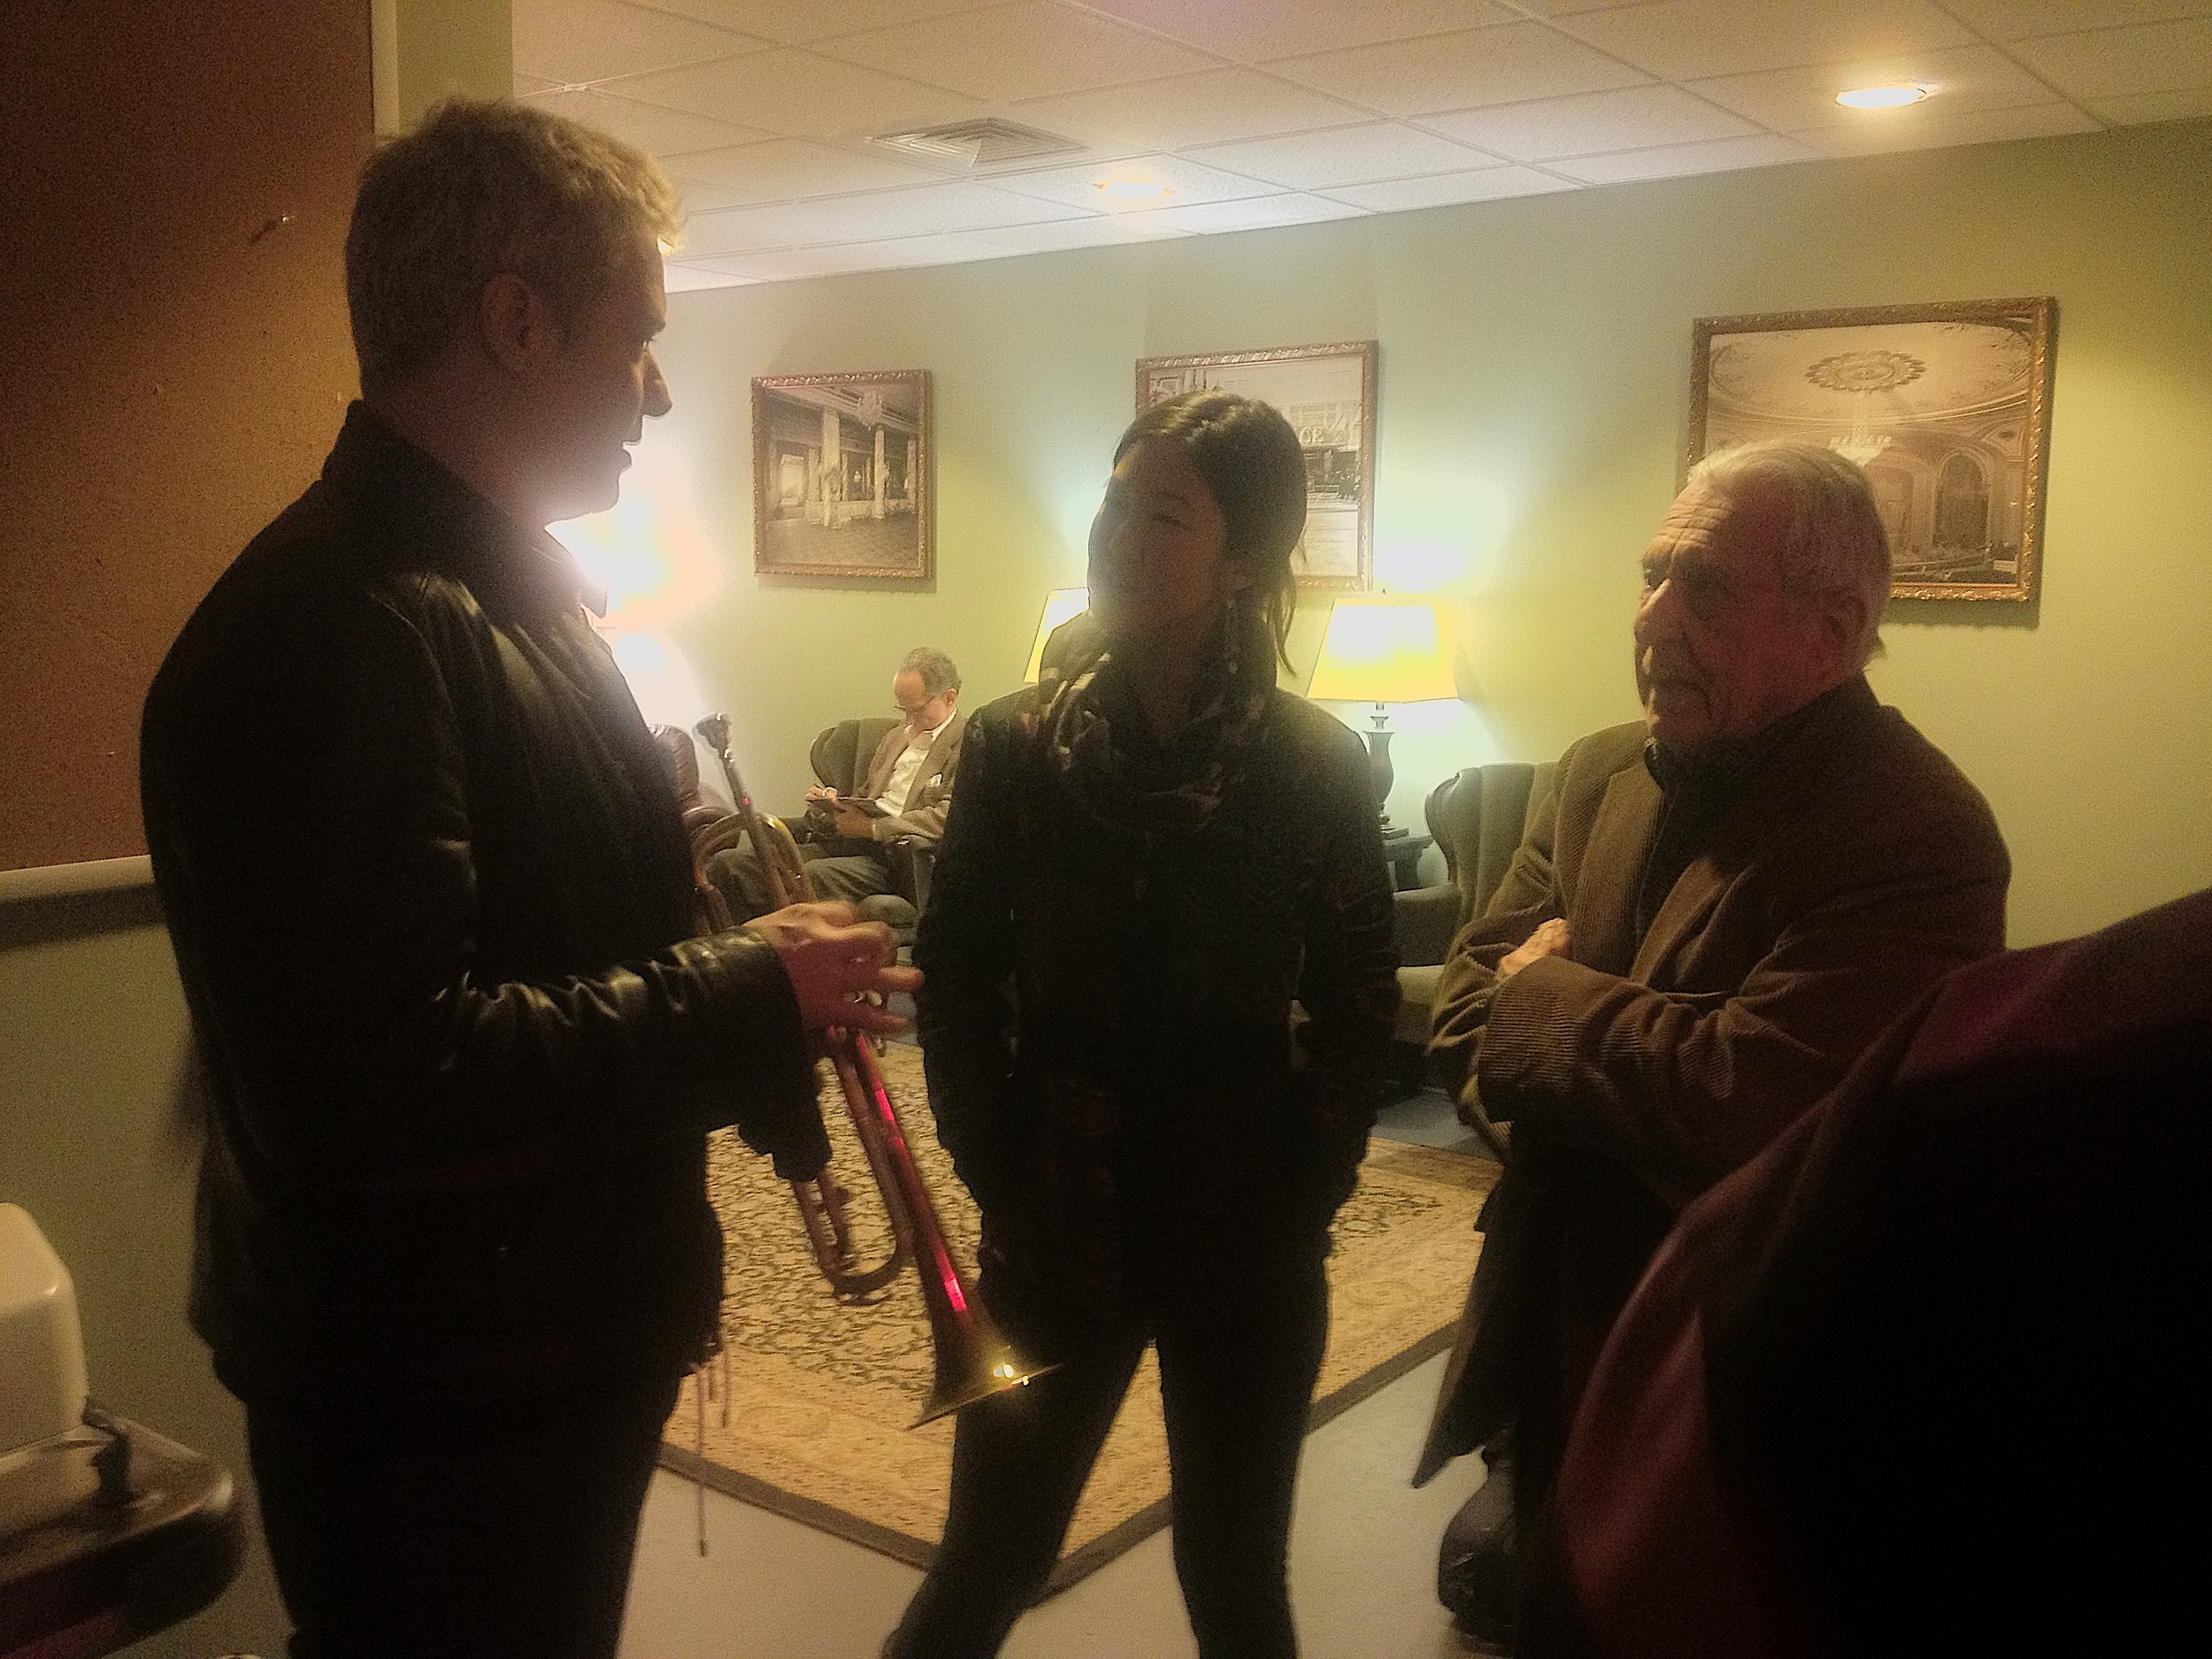 Fred, Chris Botti and Grace IMG_2353.JPG